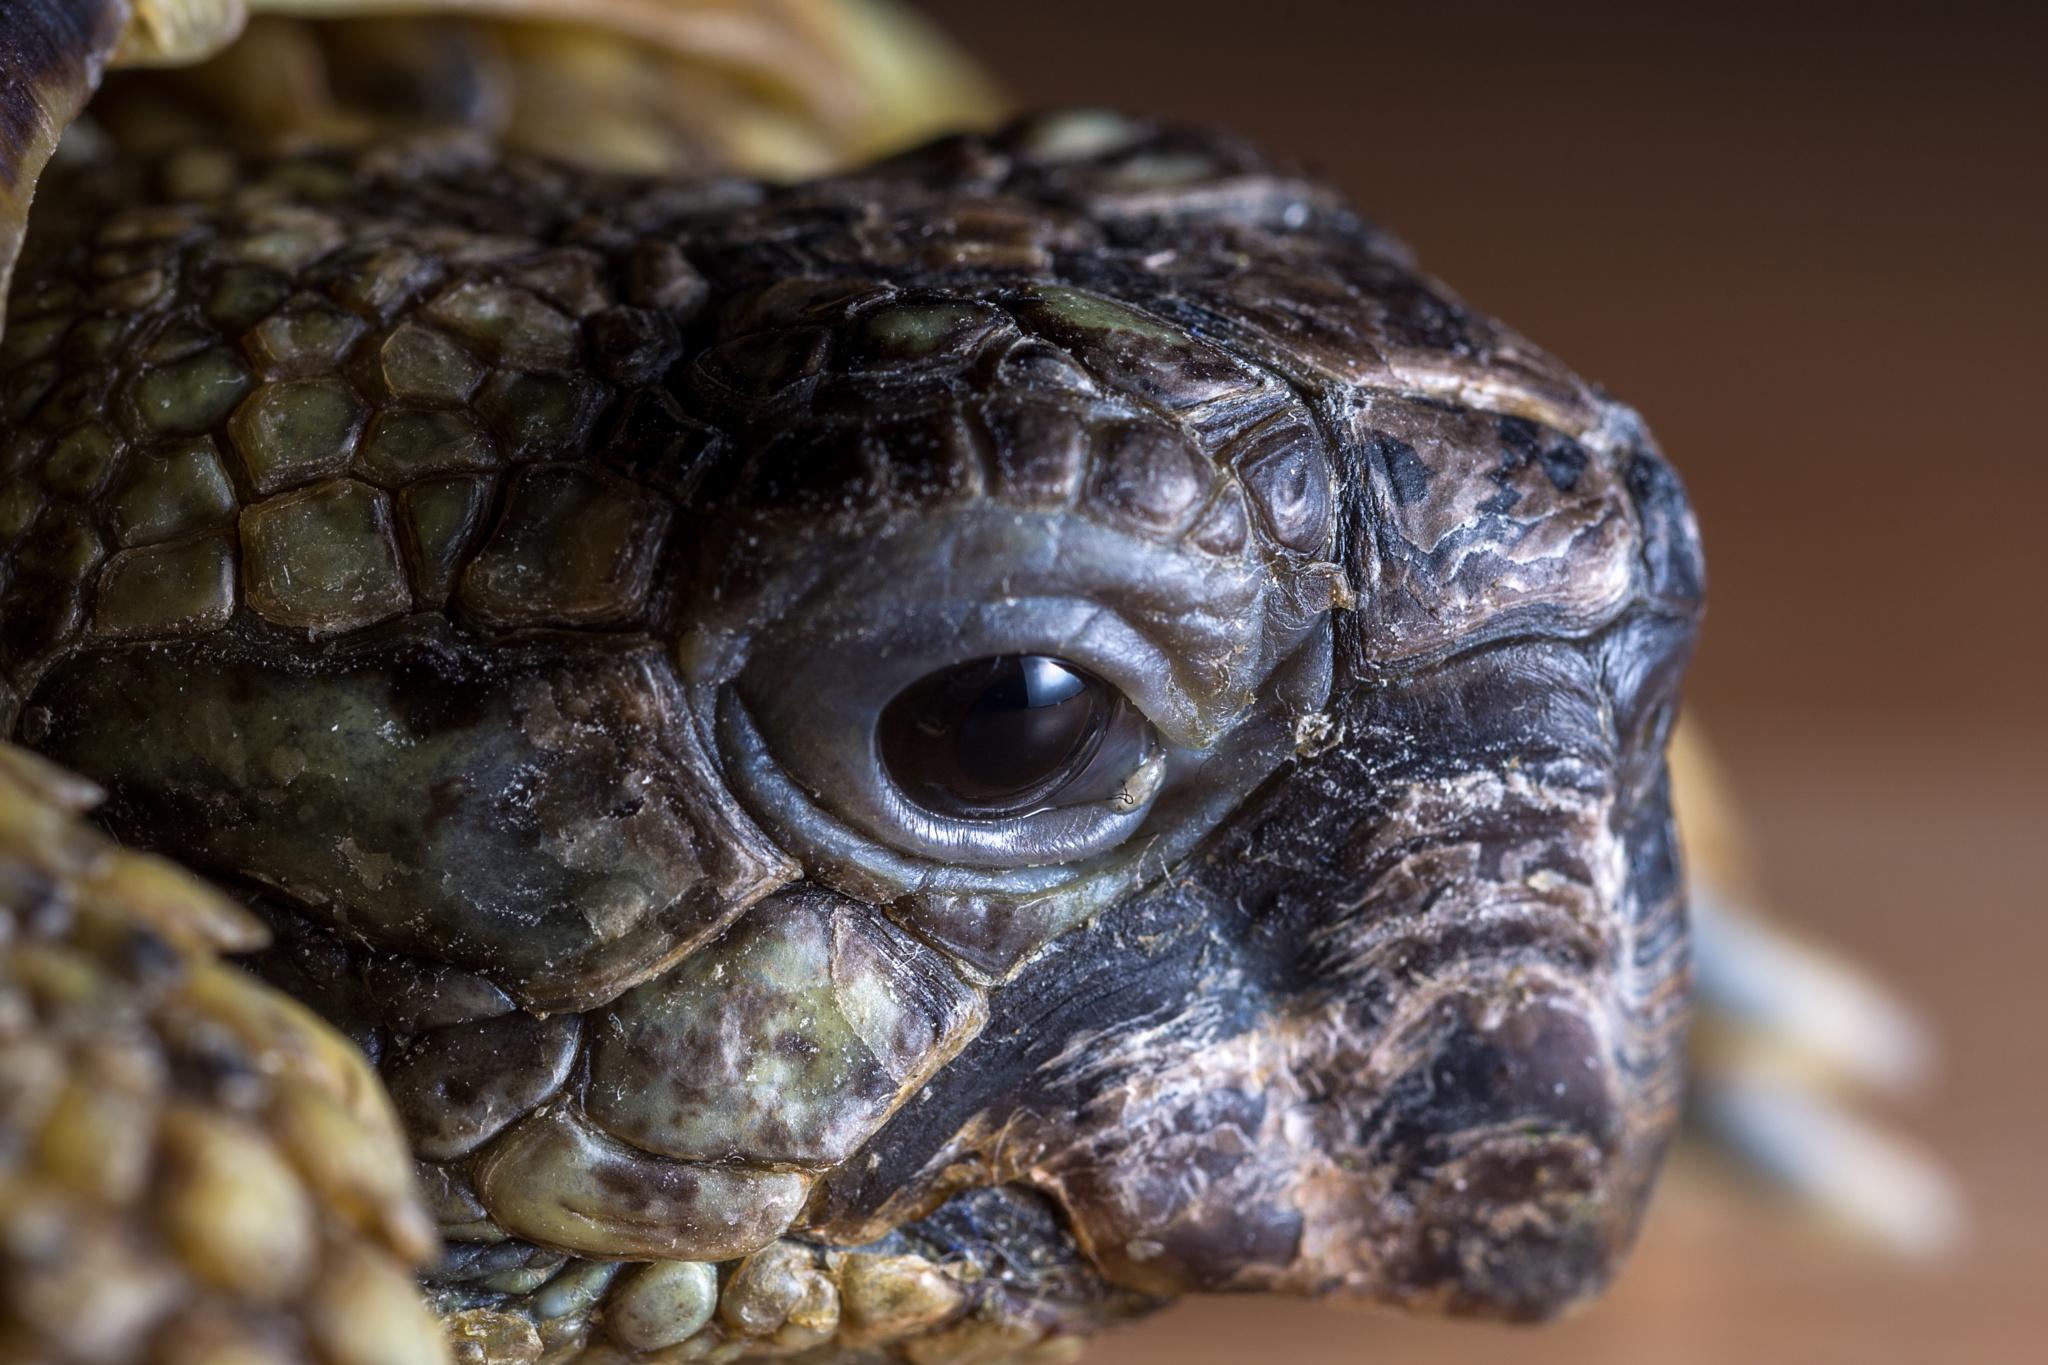 Tortoise by Gary Ellis